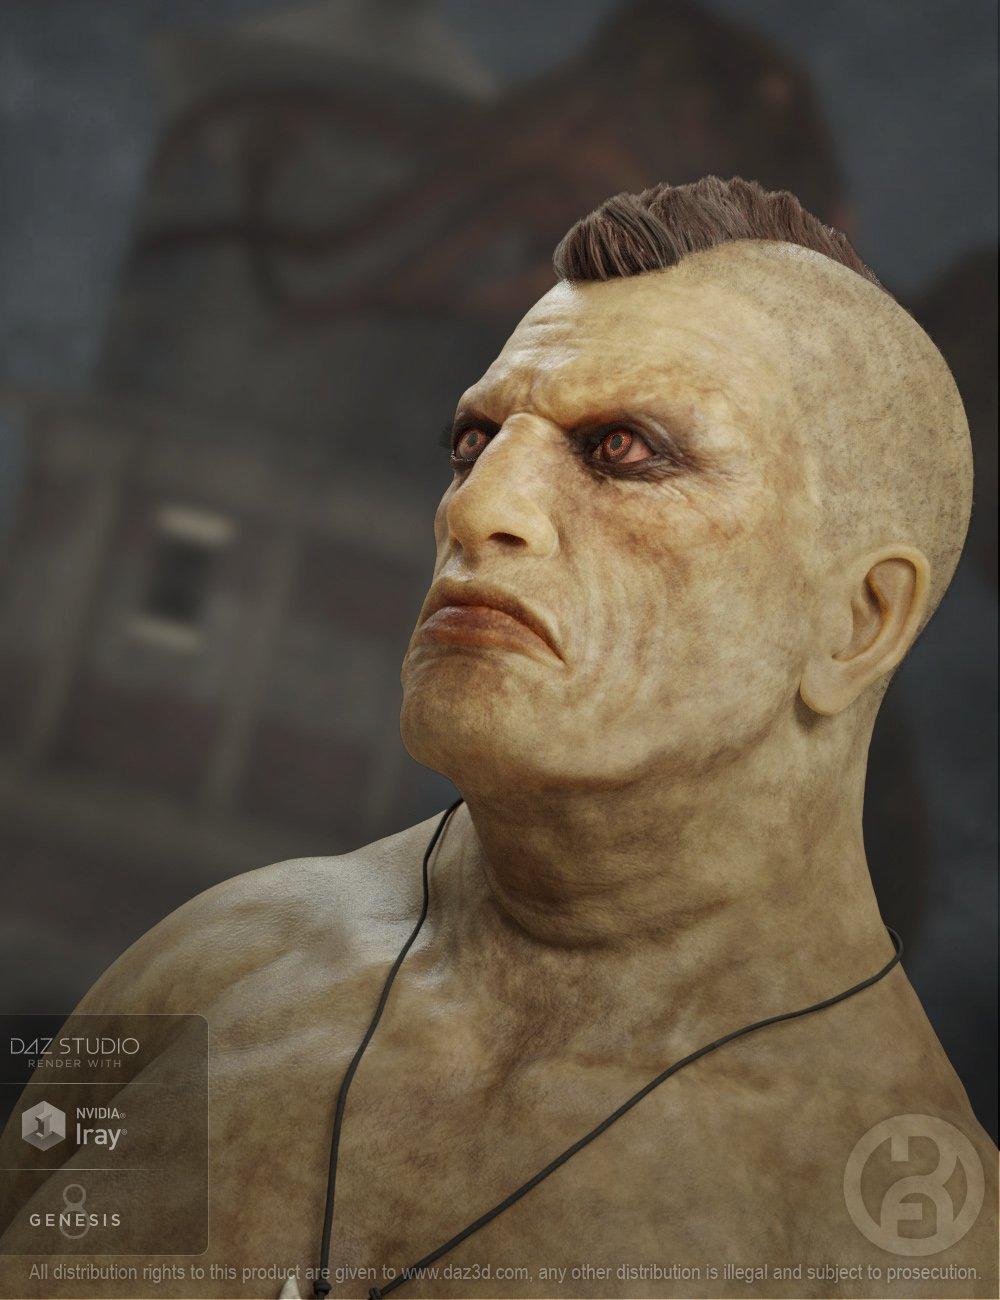 Innis for Genesis 8 Male by: RawArt, 3D Models by Daz 3D